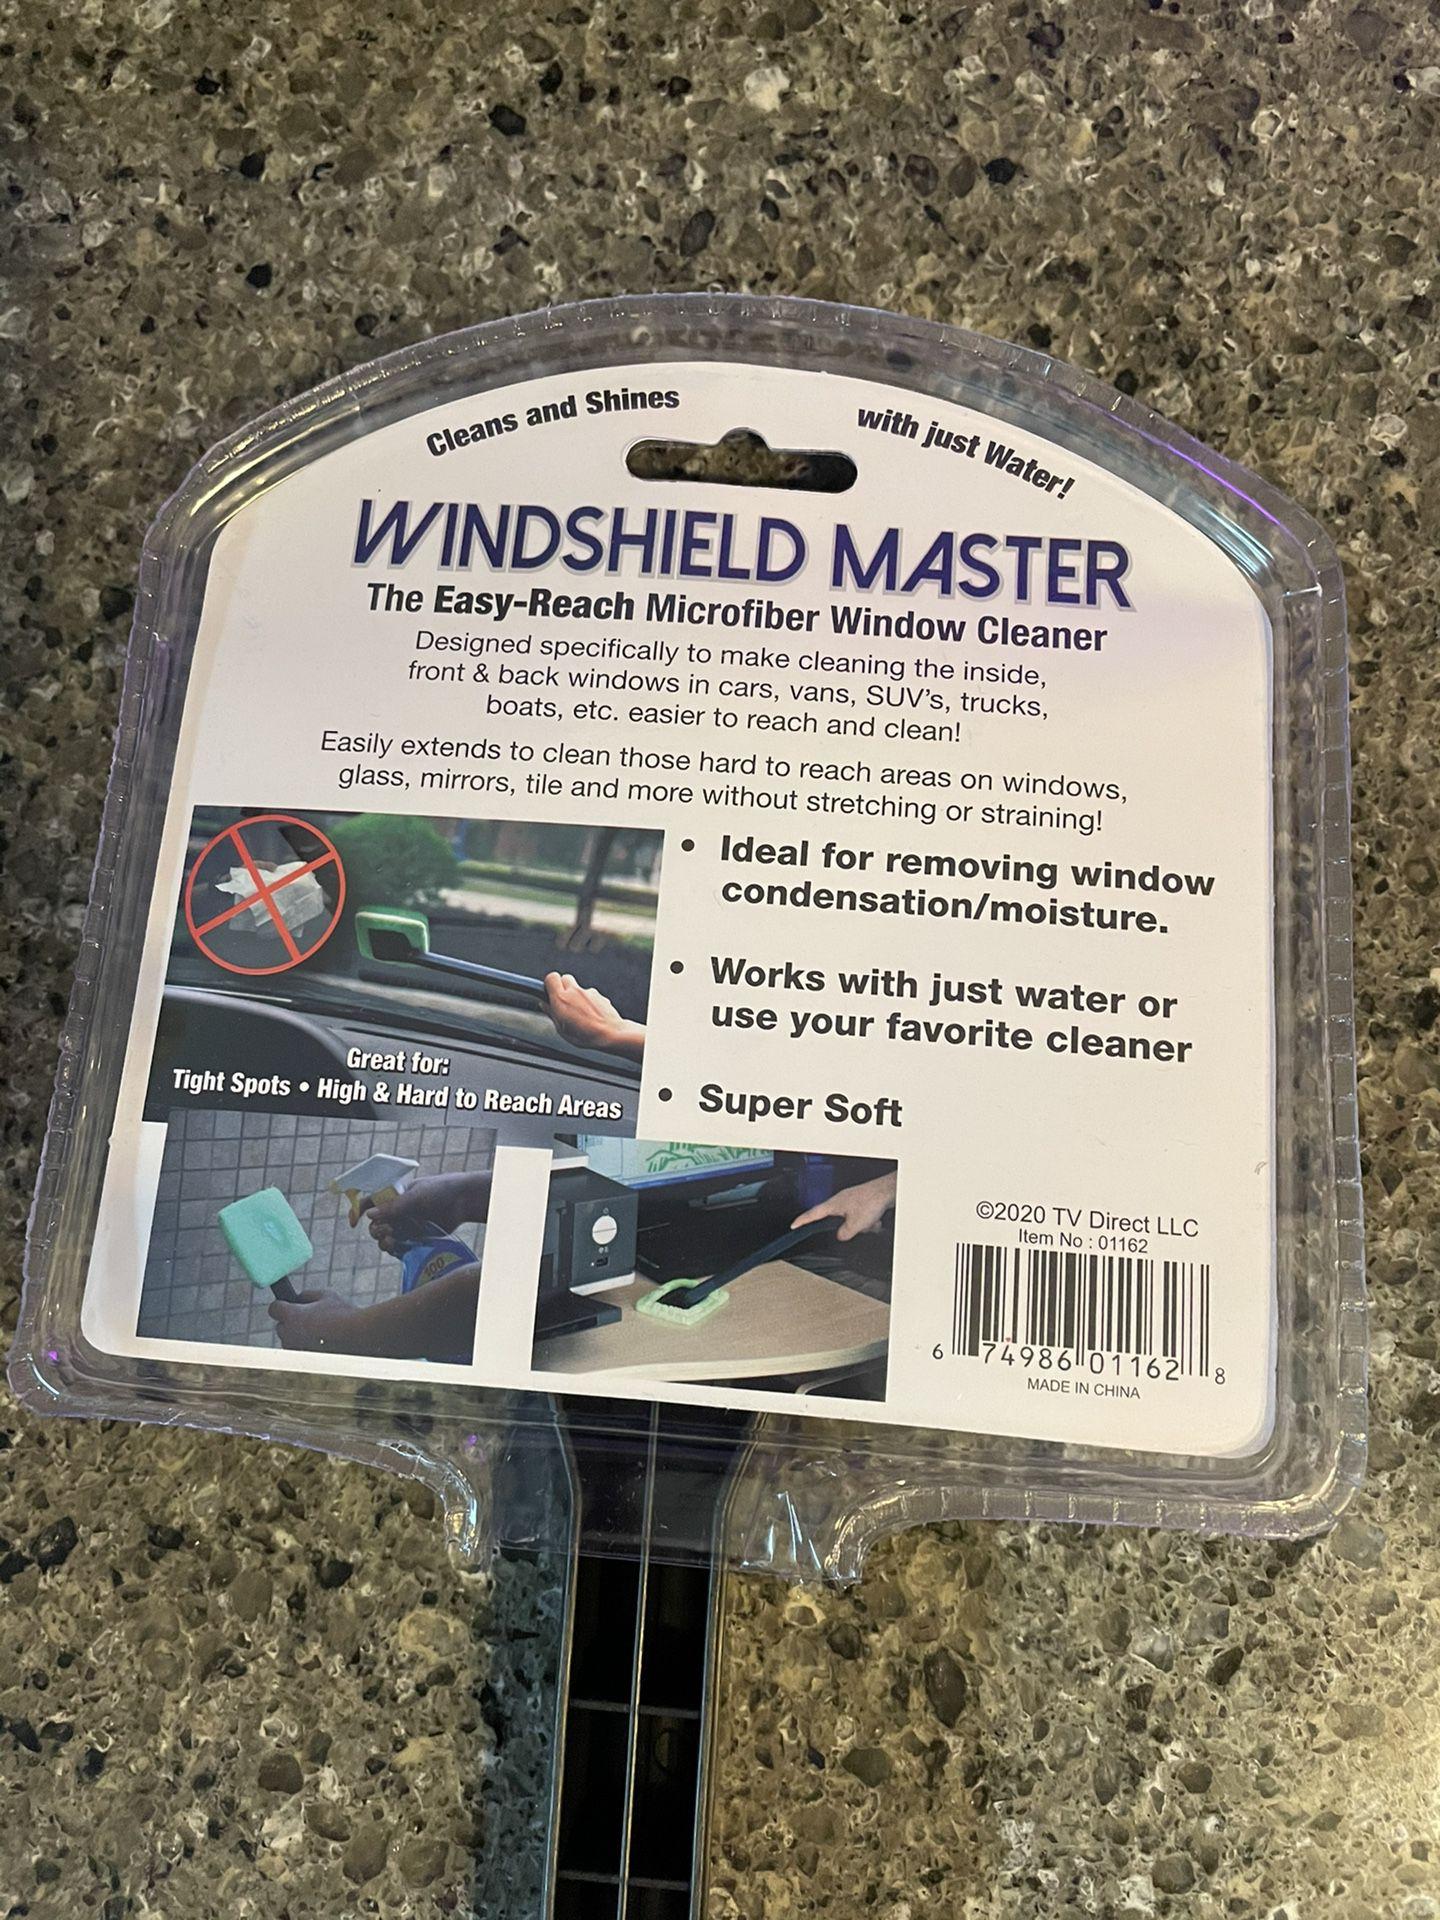 Windshield Master